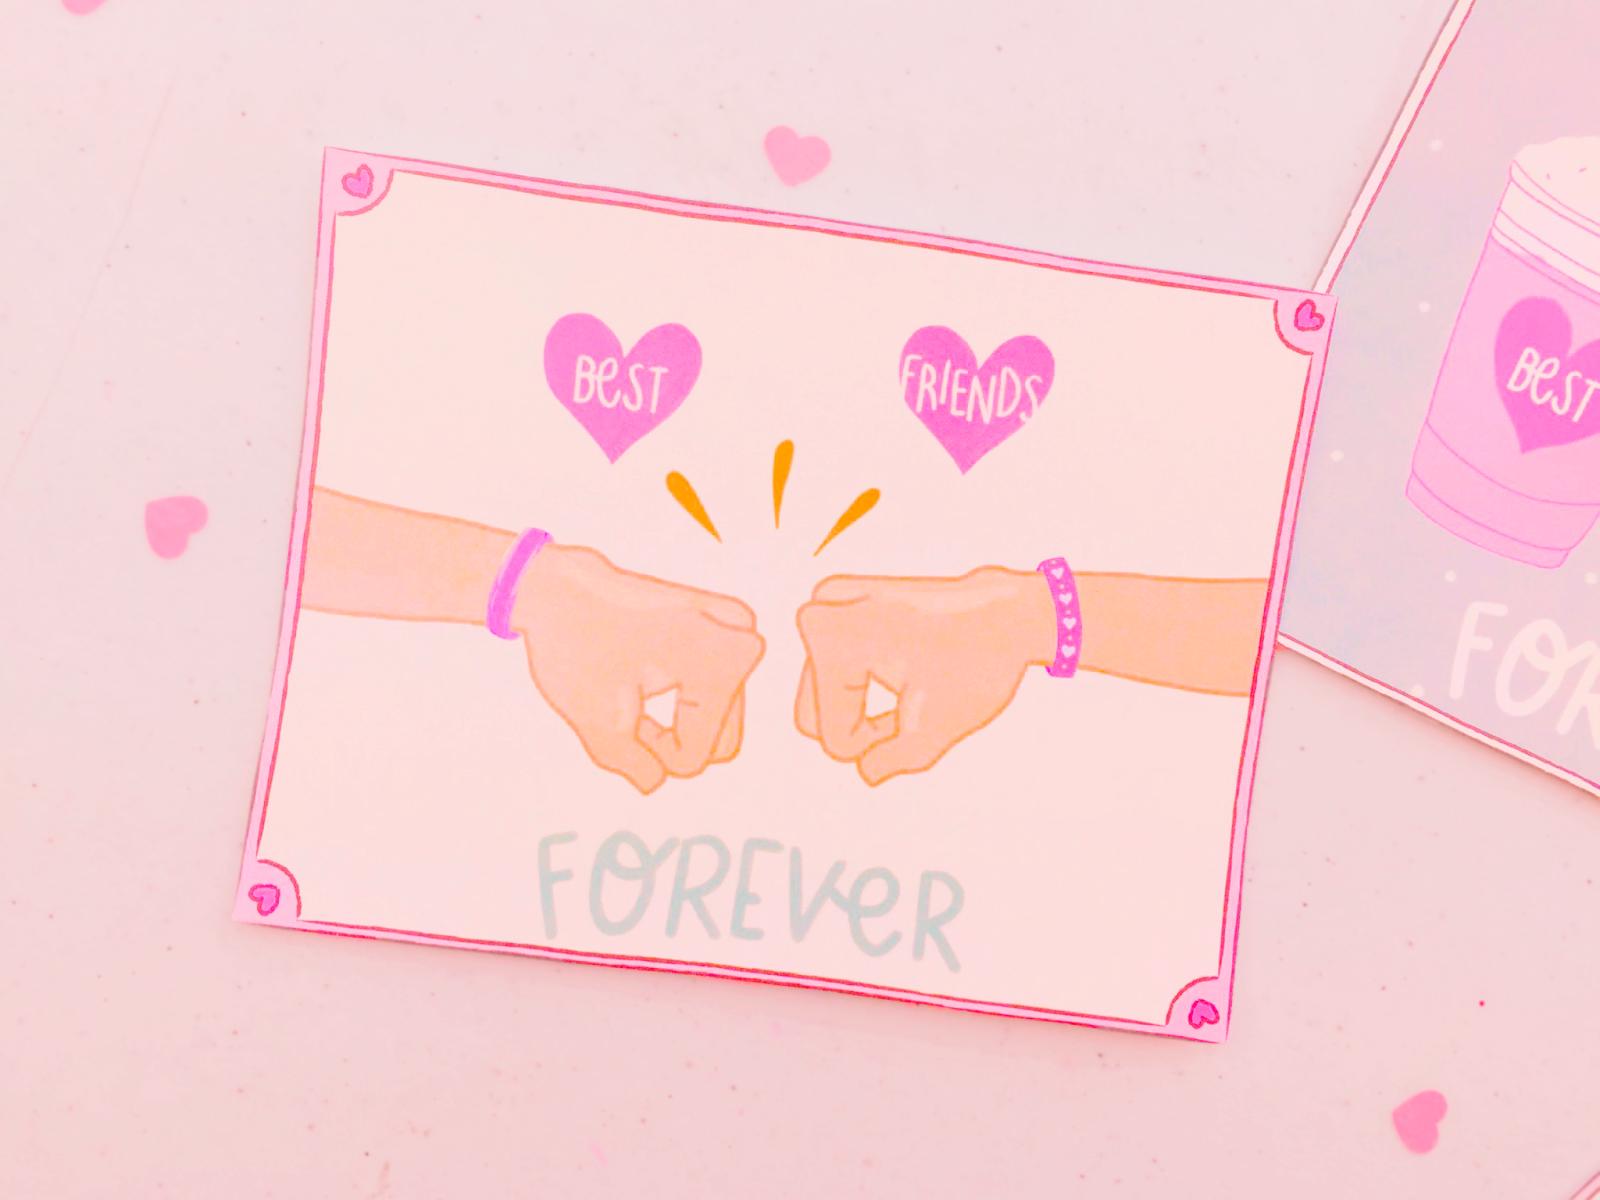 Best Friends Forever Printable Tarjetitas Para Tu Mejor Amiga